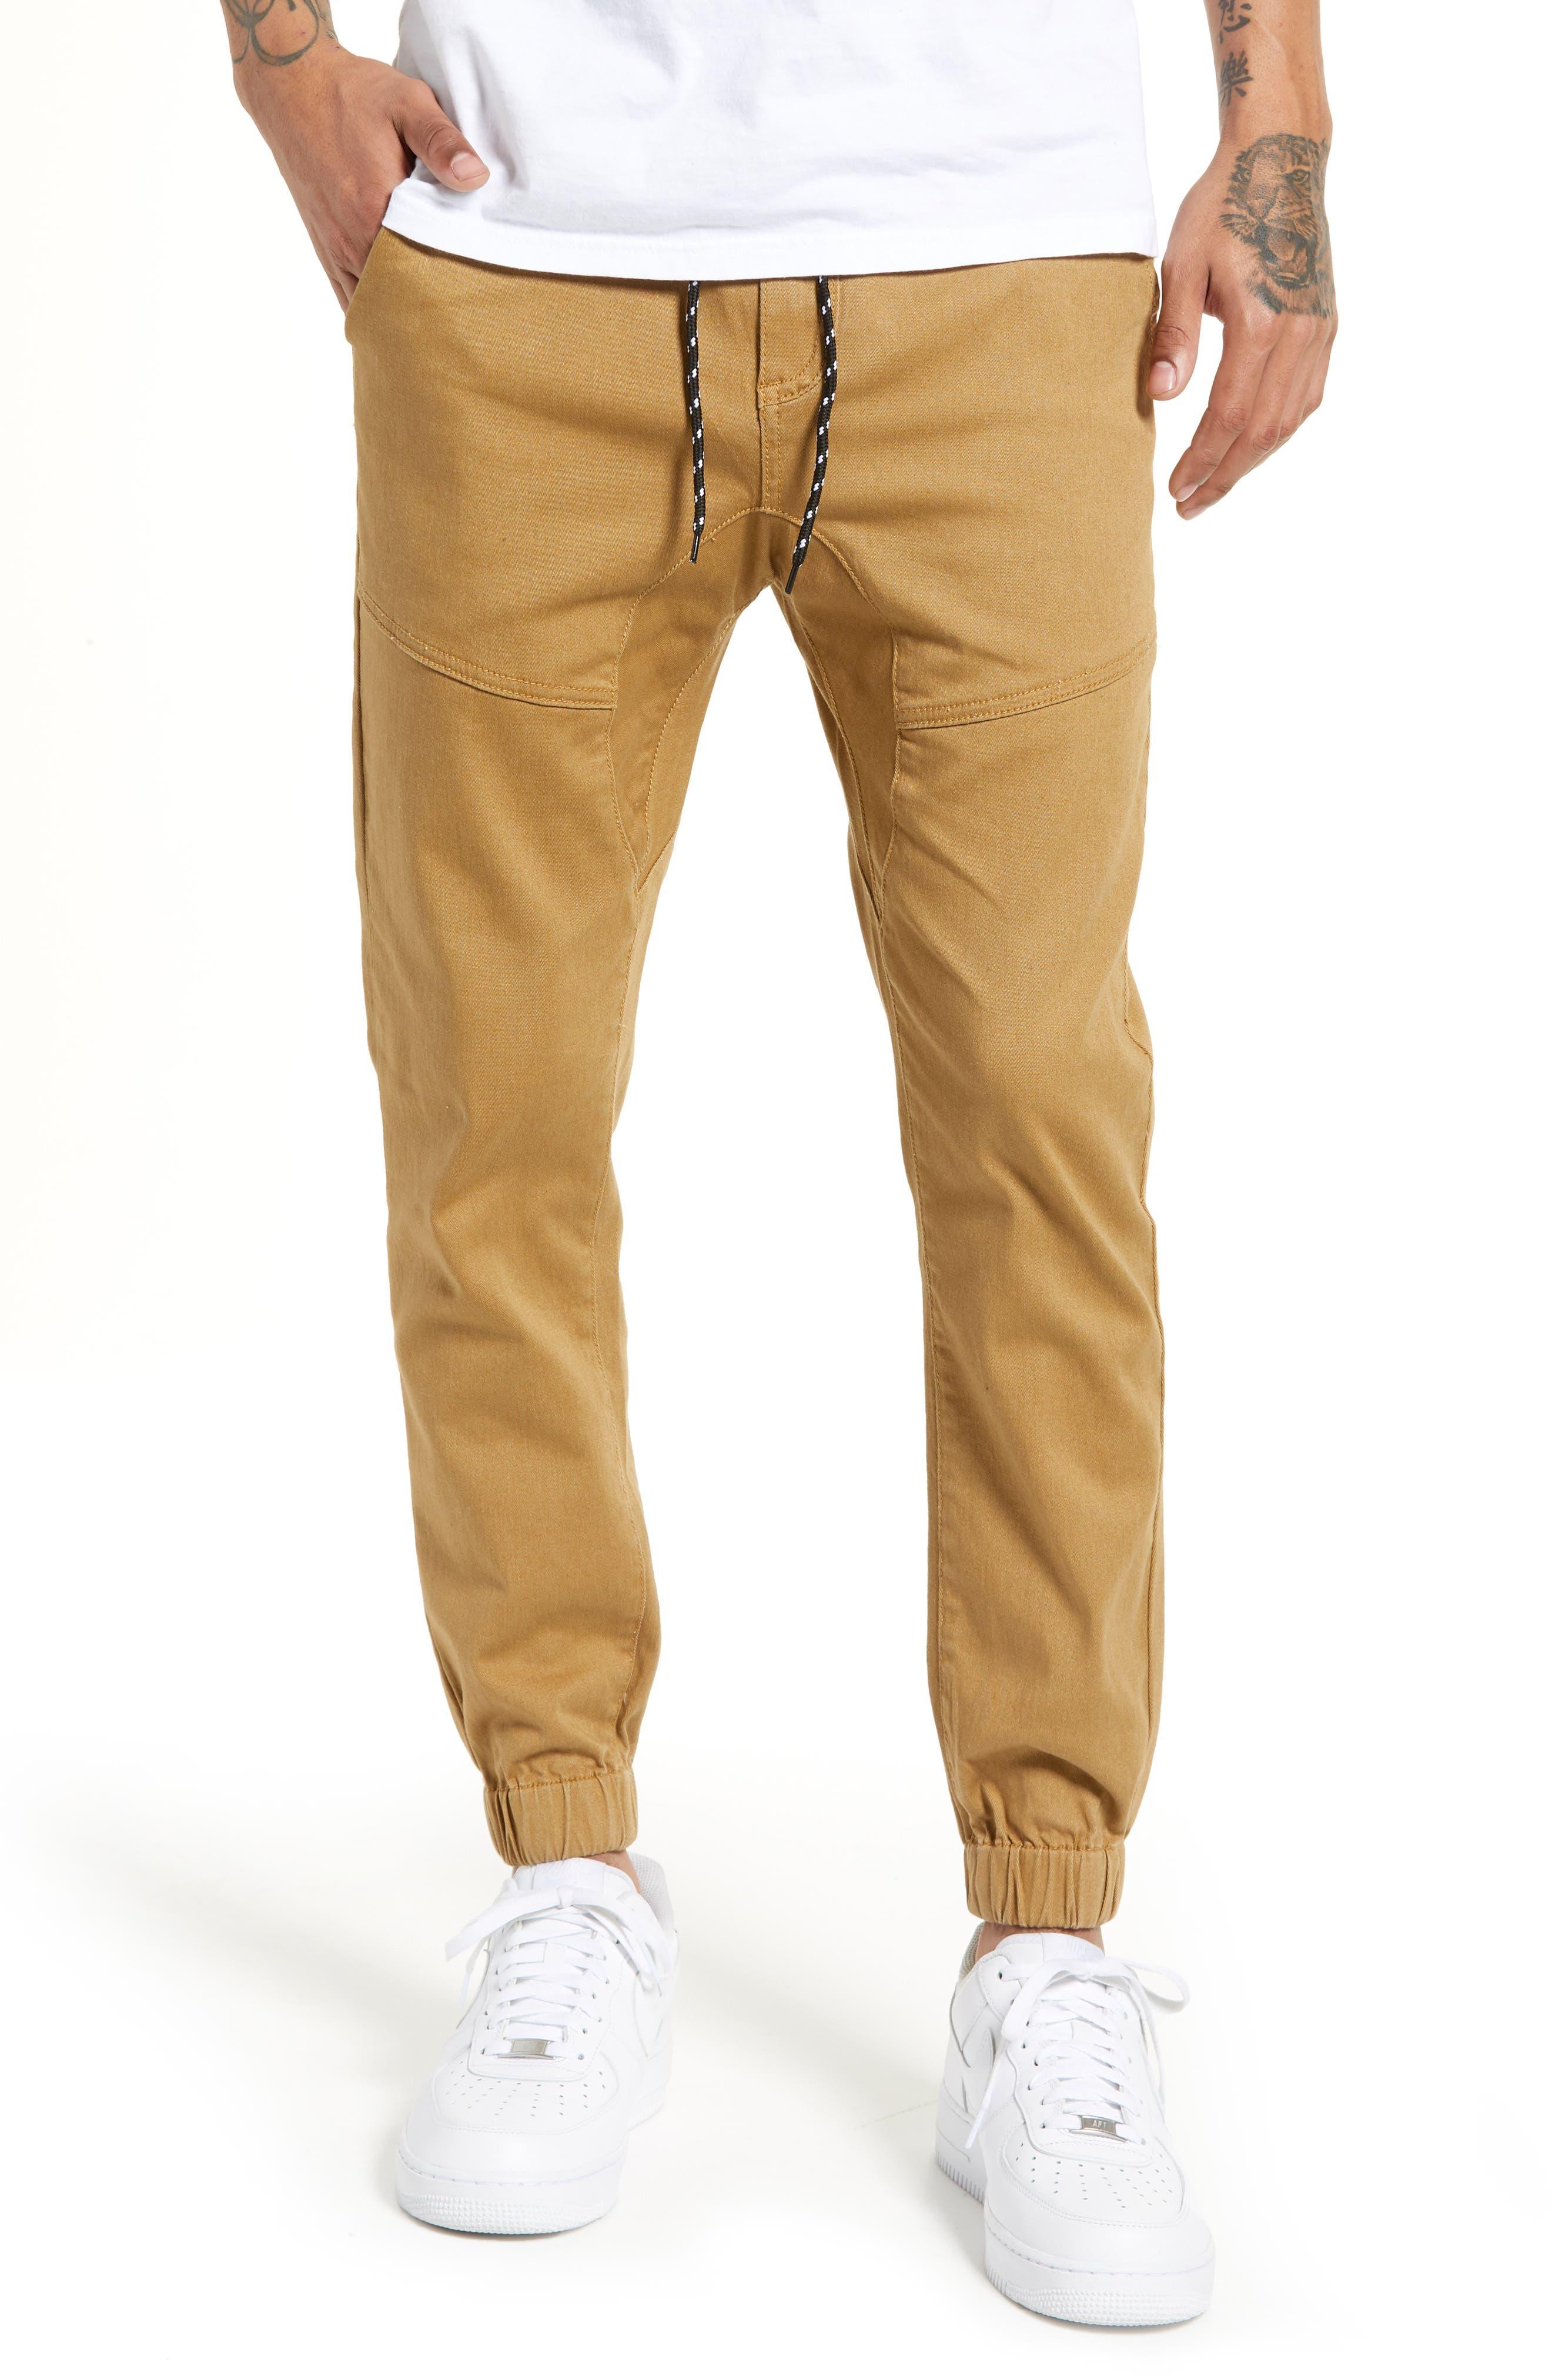 LIRA CLOTHING Clifton Slim Fit Jogger Pants, Main, color, 250